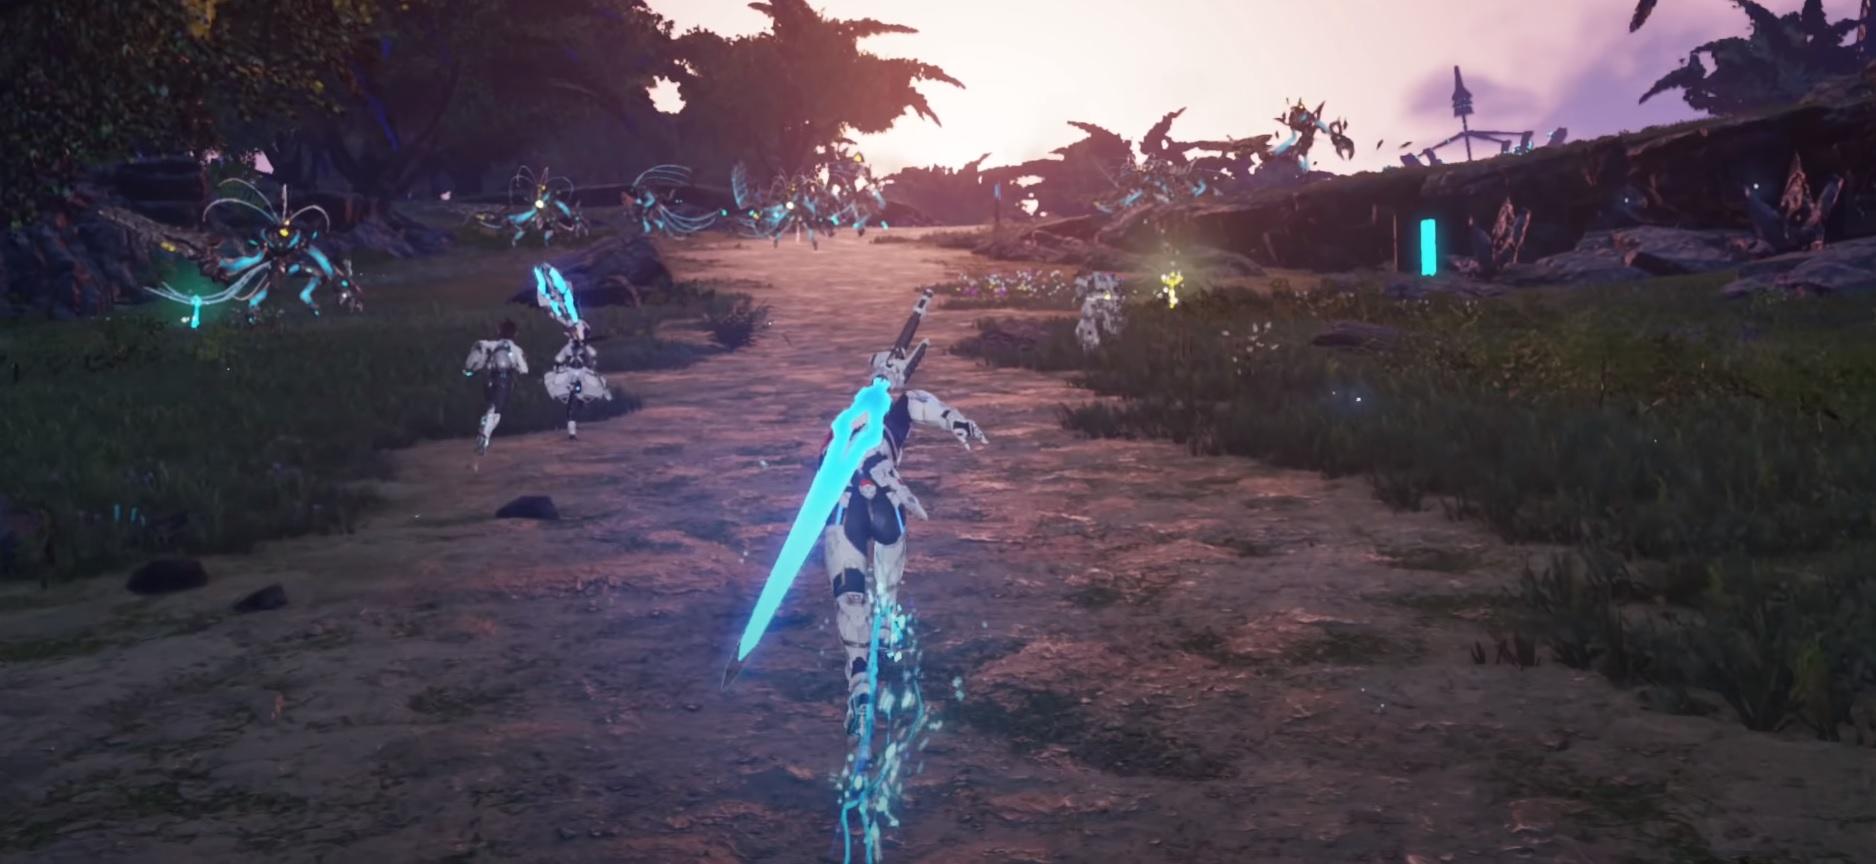 Sega tries to explain exactly what Phantasy Star Online 2: New Genesis actually is screenshot